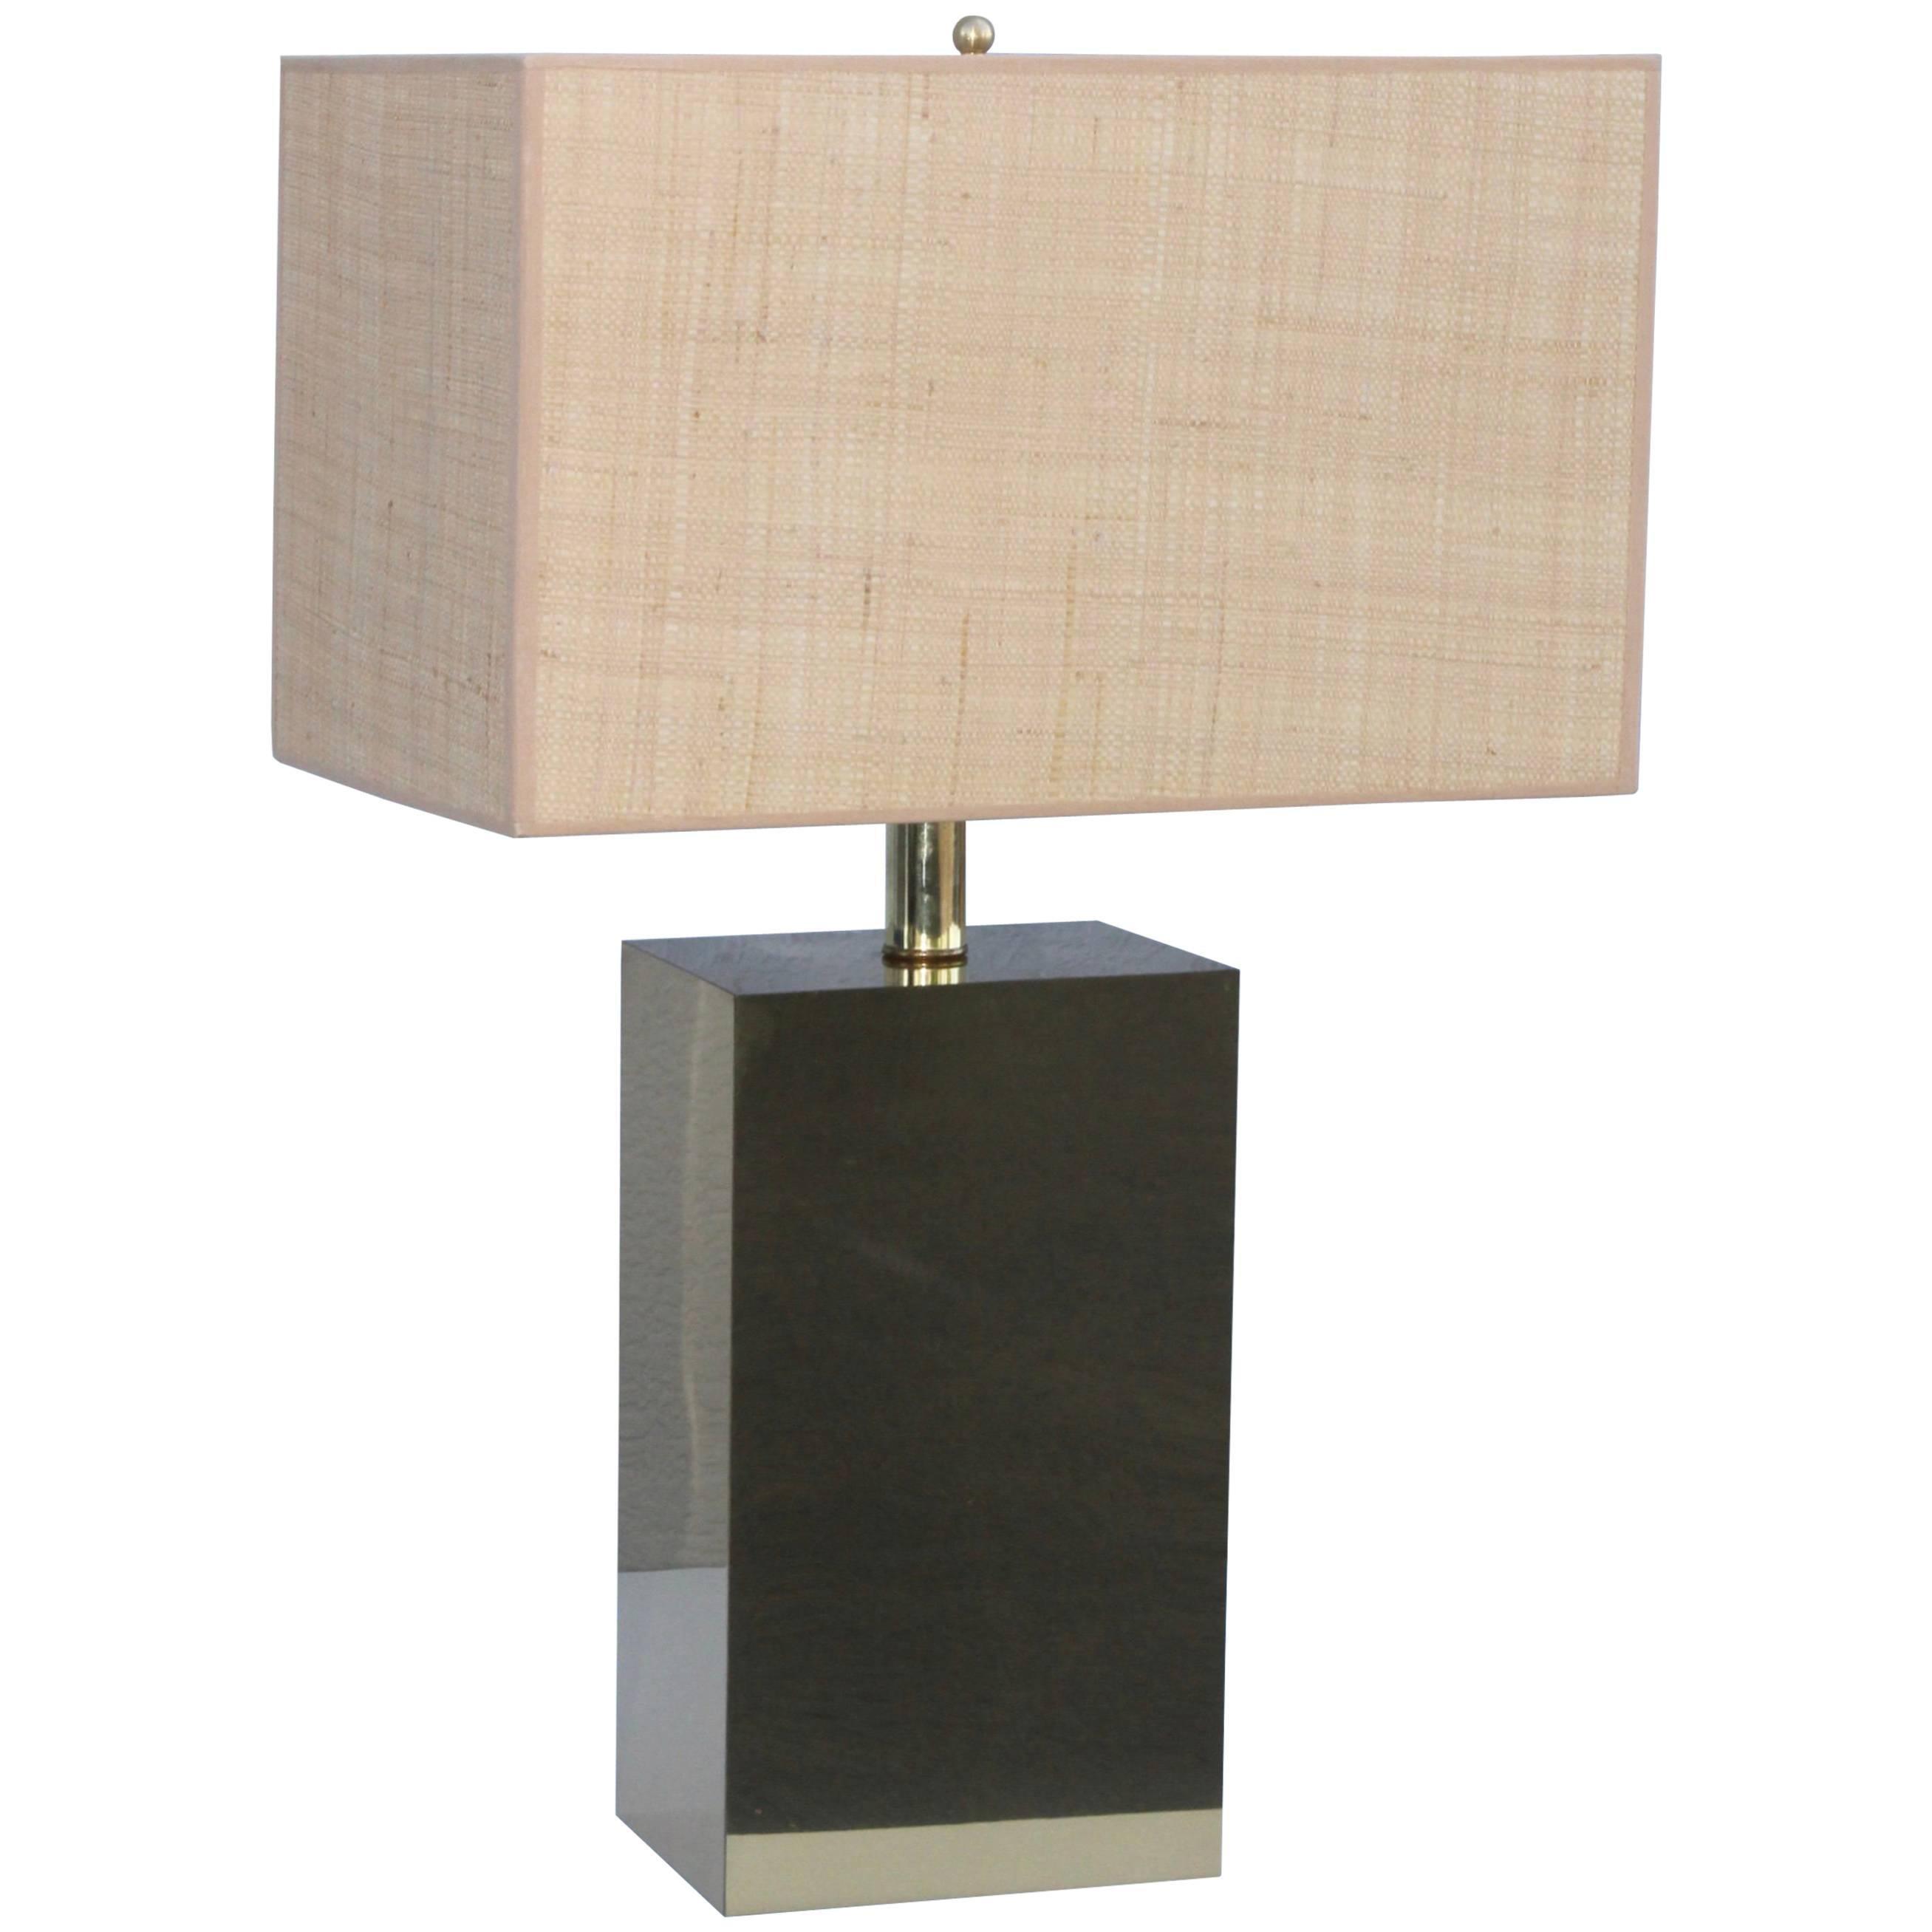 George Kovacs Modernist Brass Table Lamp